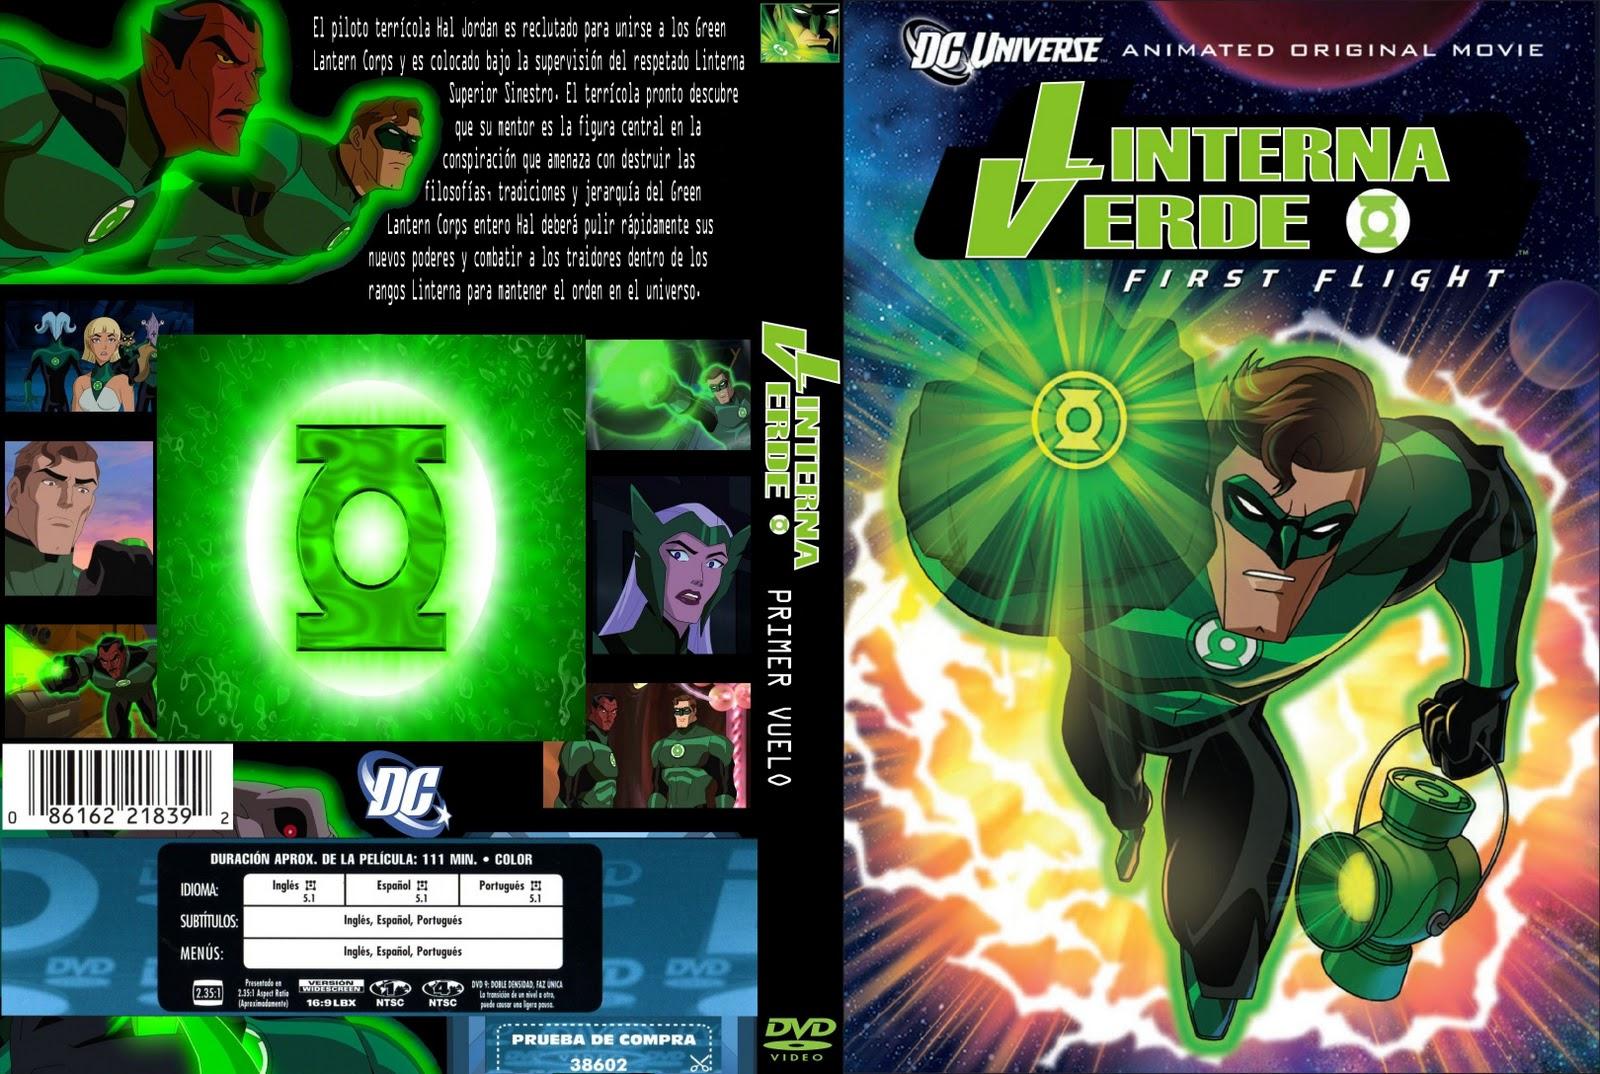 Green lantern first flight dvd full latino dating. beyblade revolution capitulo 51 latino dating.